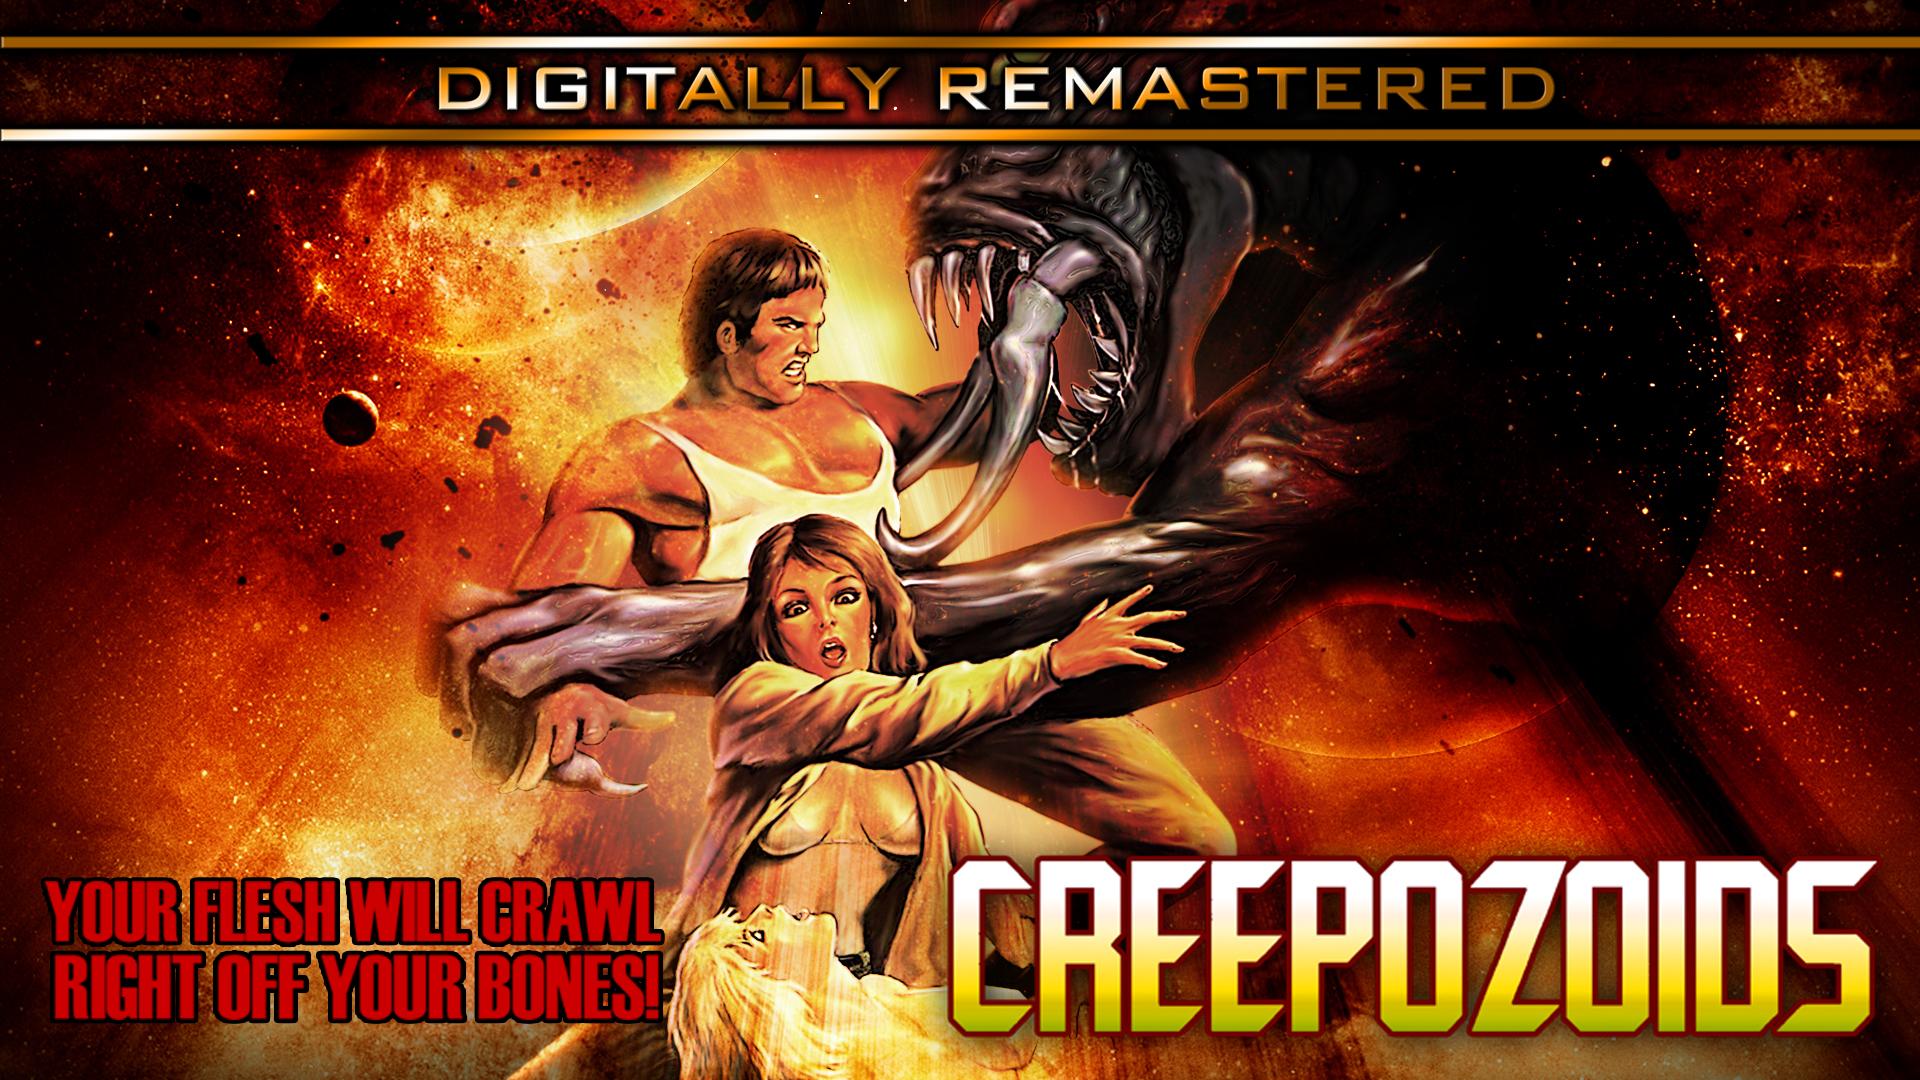 Creepozoids: REMASTERED